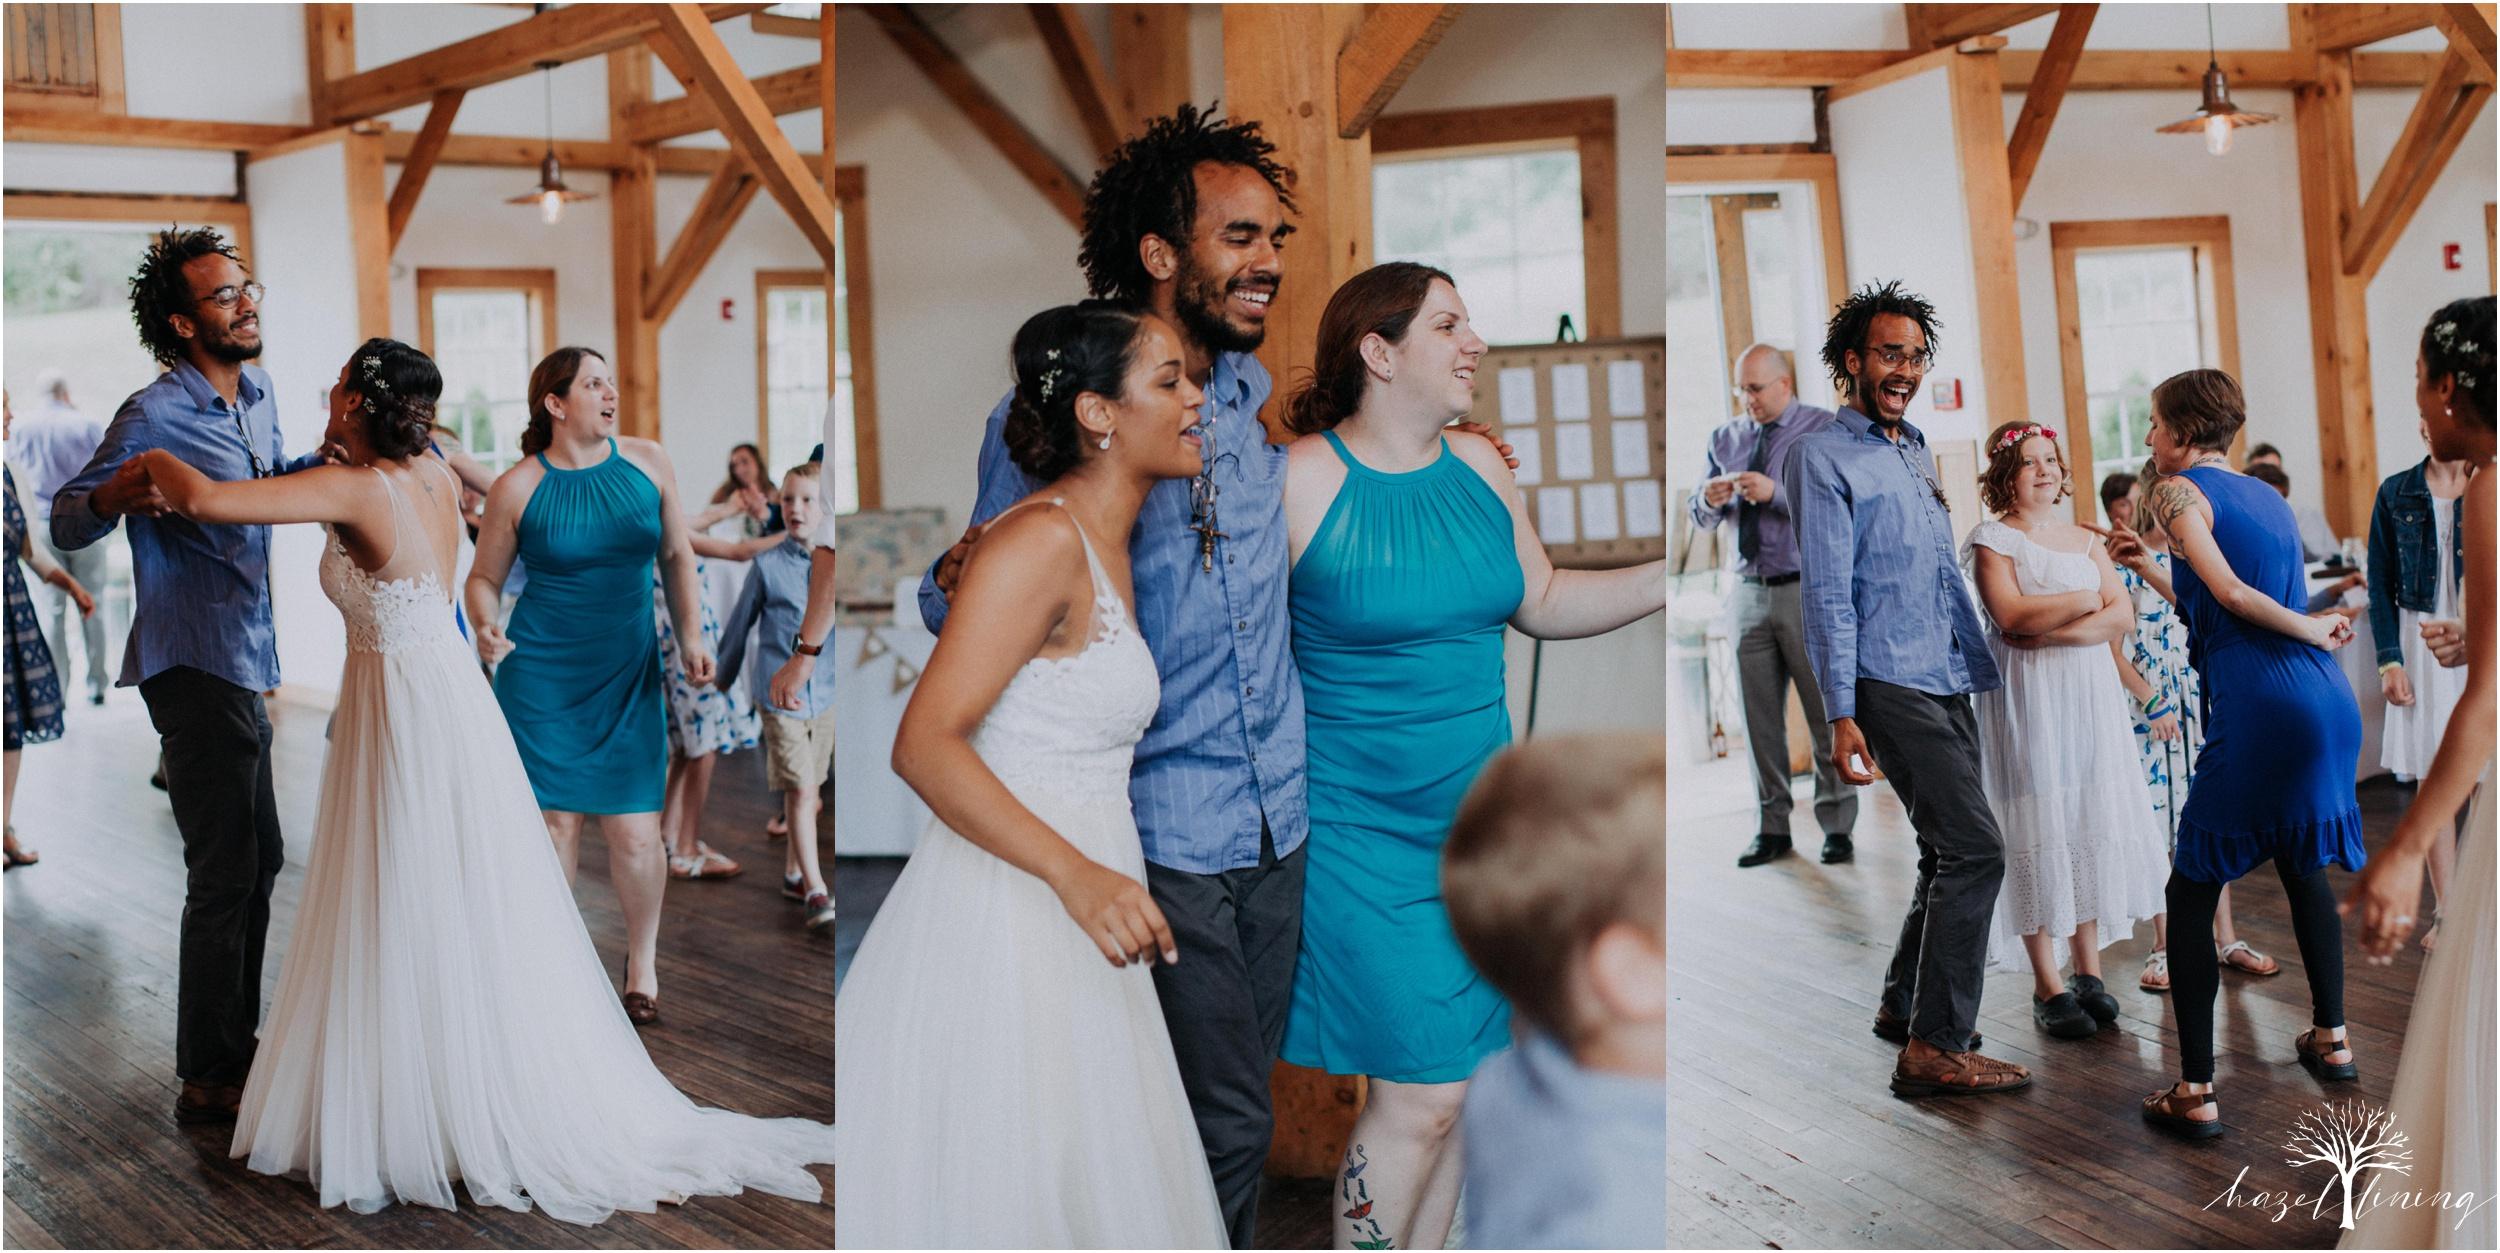 mariah-kreyling-samuel-sherratt-sherrattwiththeworld-peirce-farm-at-witch-hill-boston-massachusetts-wedding-photography-hazel-lining-travel-wedding-elopement-photography_0194.jpg